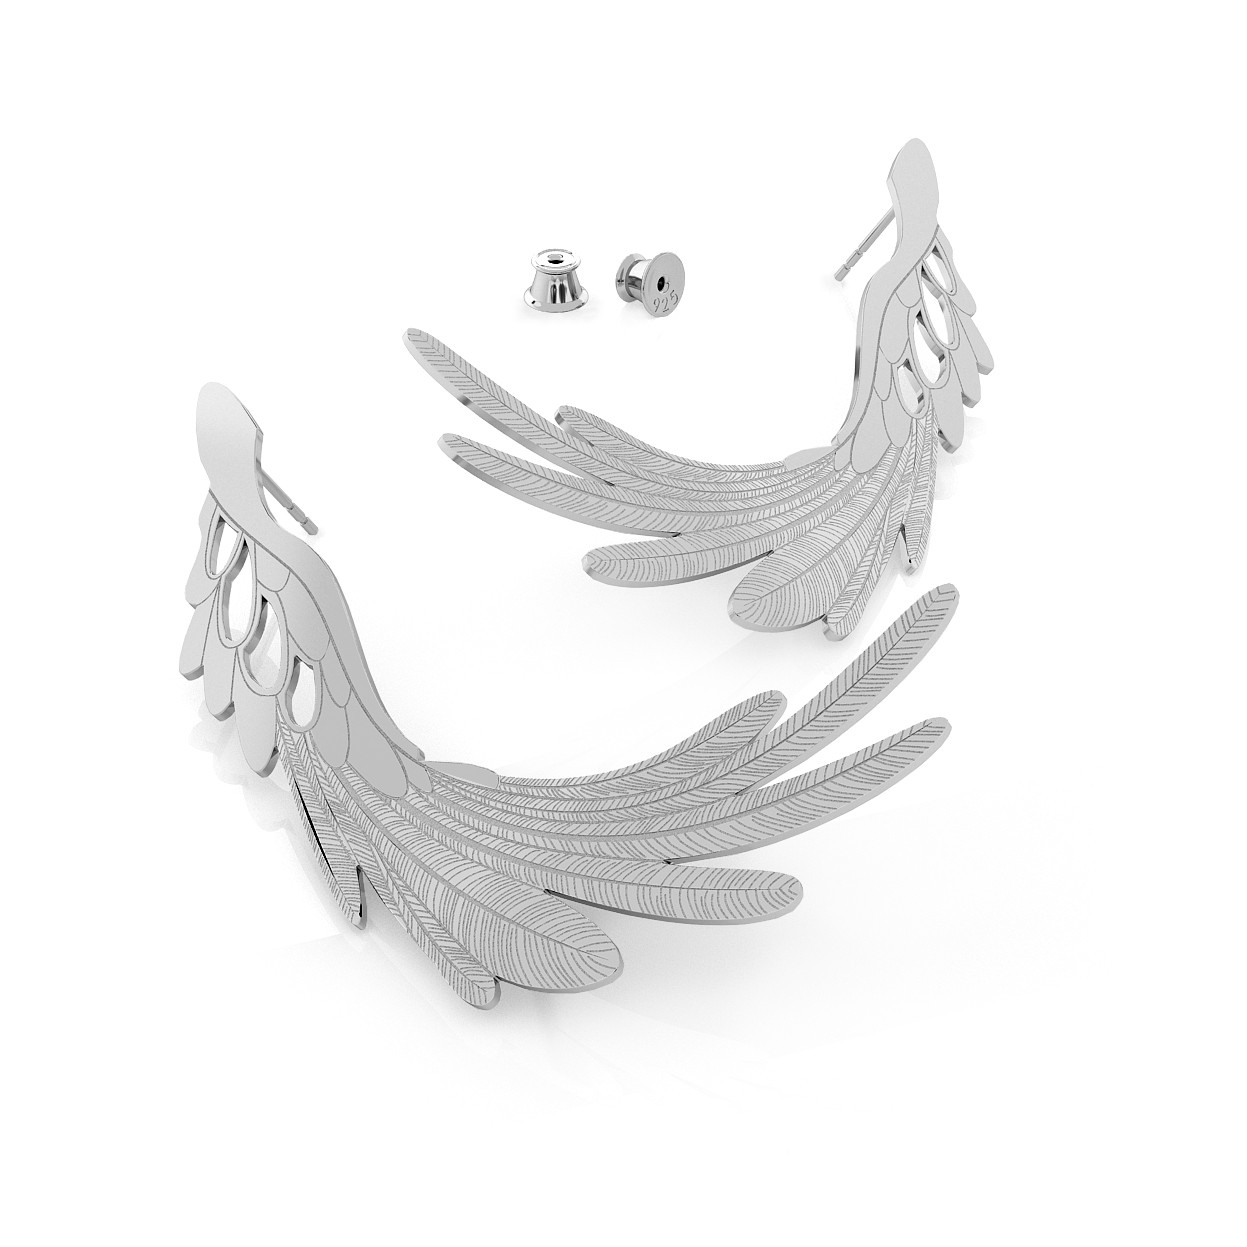 EARRINGS BIG ANGEL WINGS, STERLING SILVER (925) RHODIUM OR GOLD PLATED